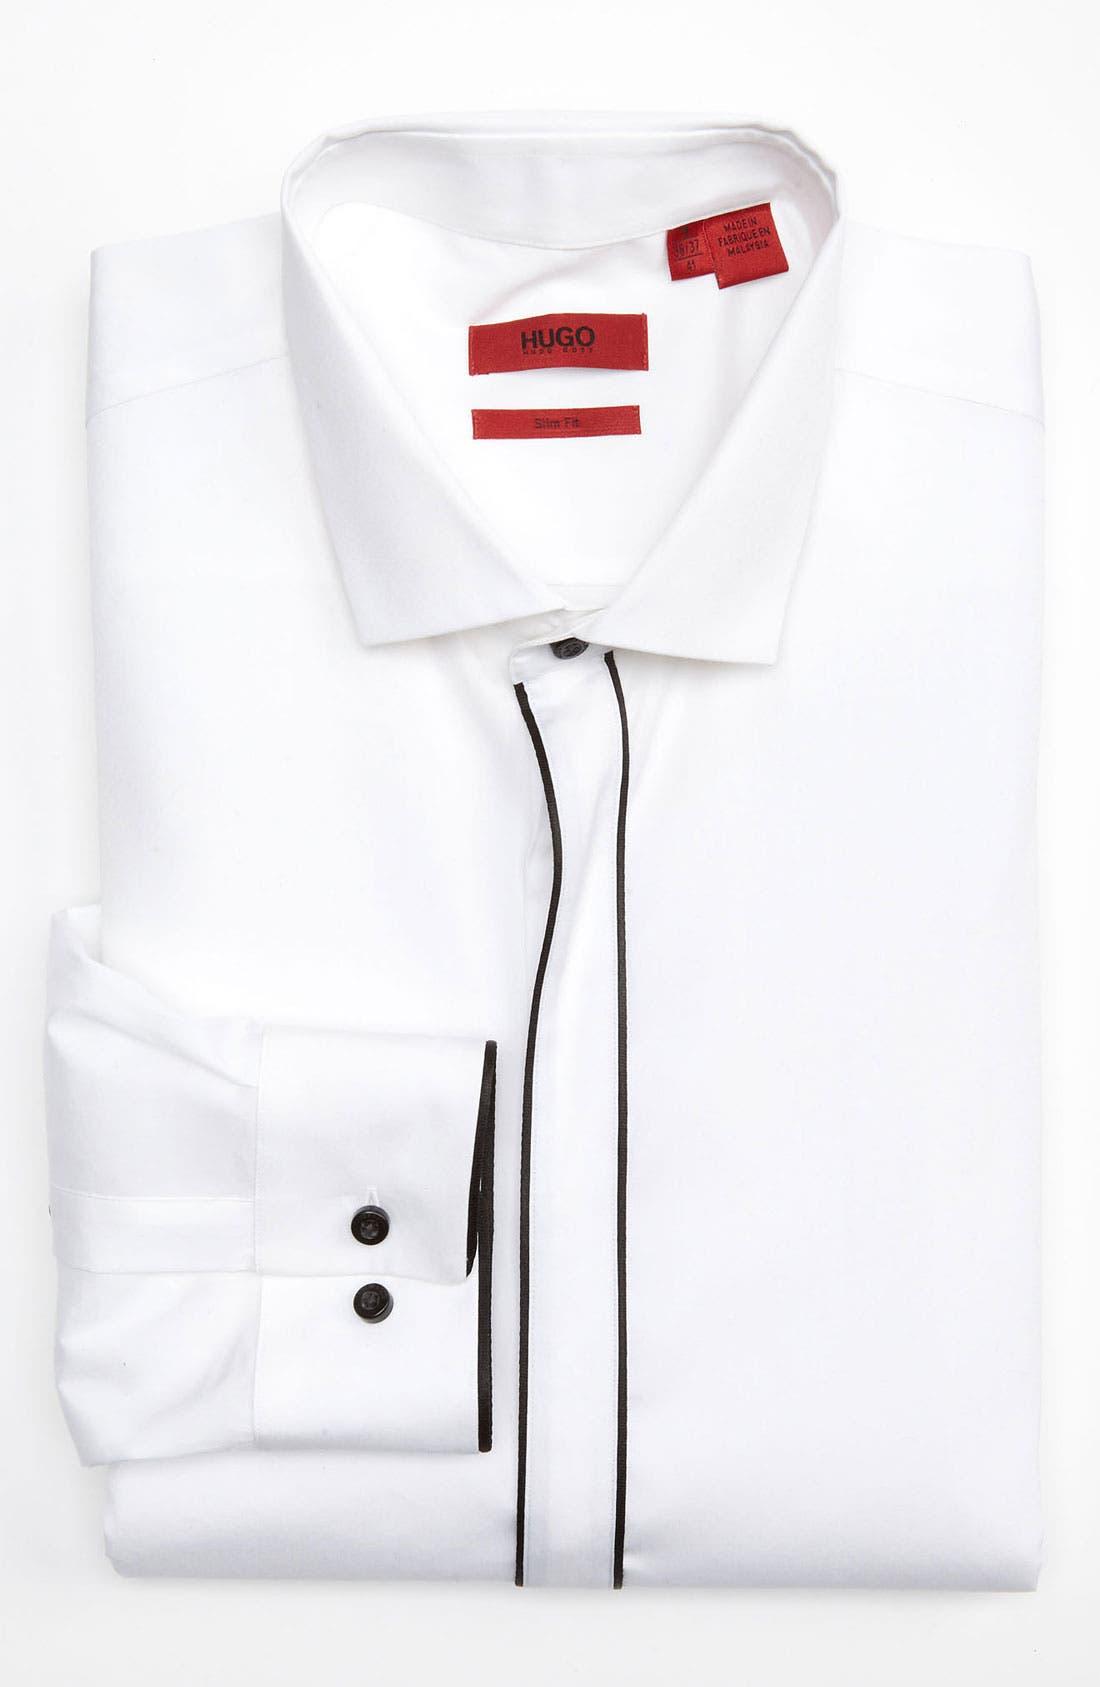 Main Image - HUGO 'Excitex' Slim Fit Tuxedo Shirt